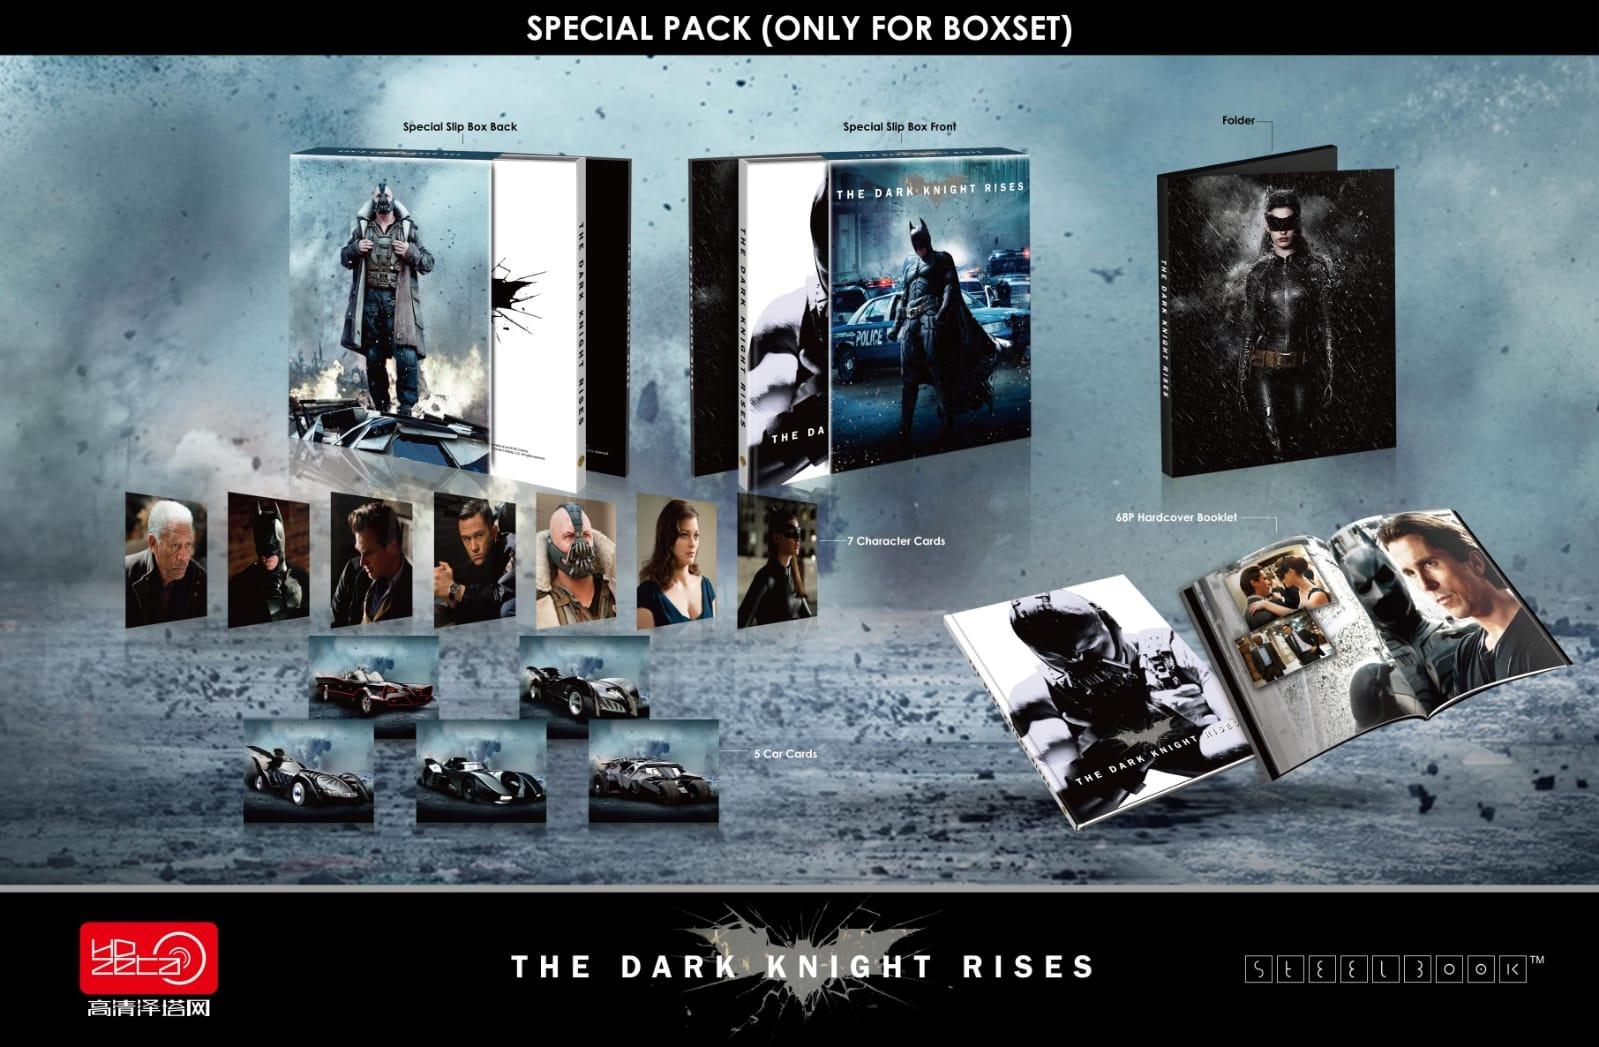 Hdzeta The Dark Knight Rises Hdzeta Gold Label Exclusive 22 Wea 4k Uhd 2d Blu Ray Steelbook China Hdzeta Media Psychos